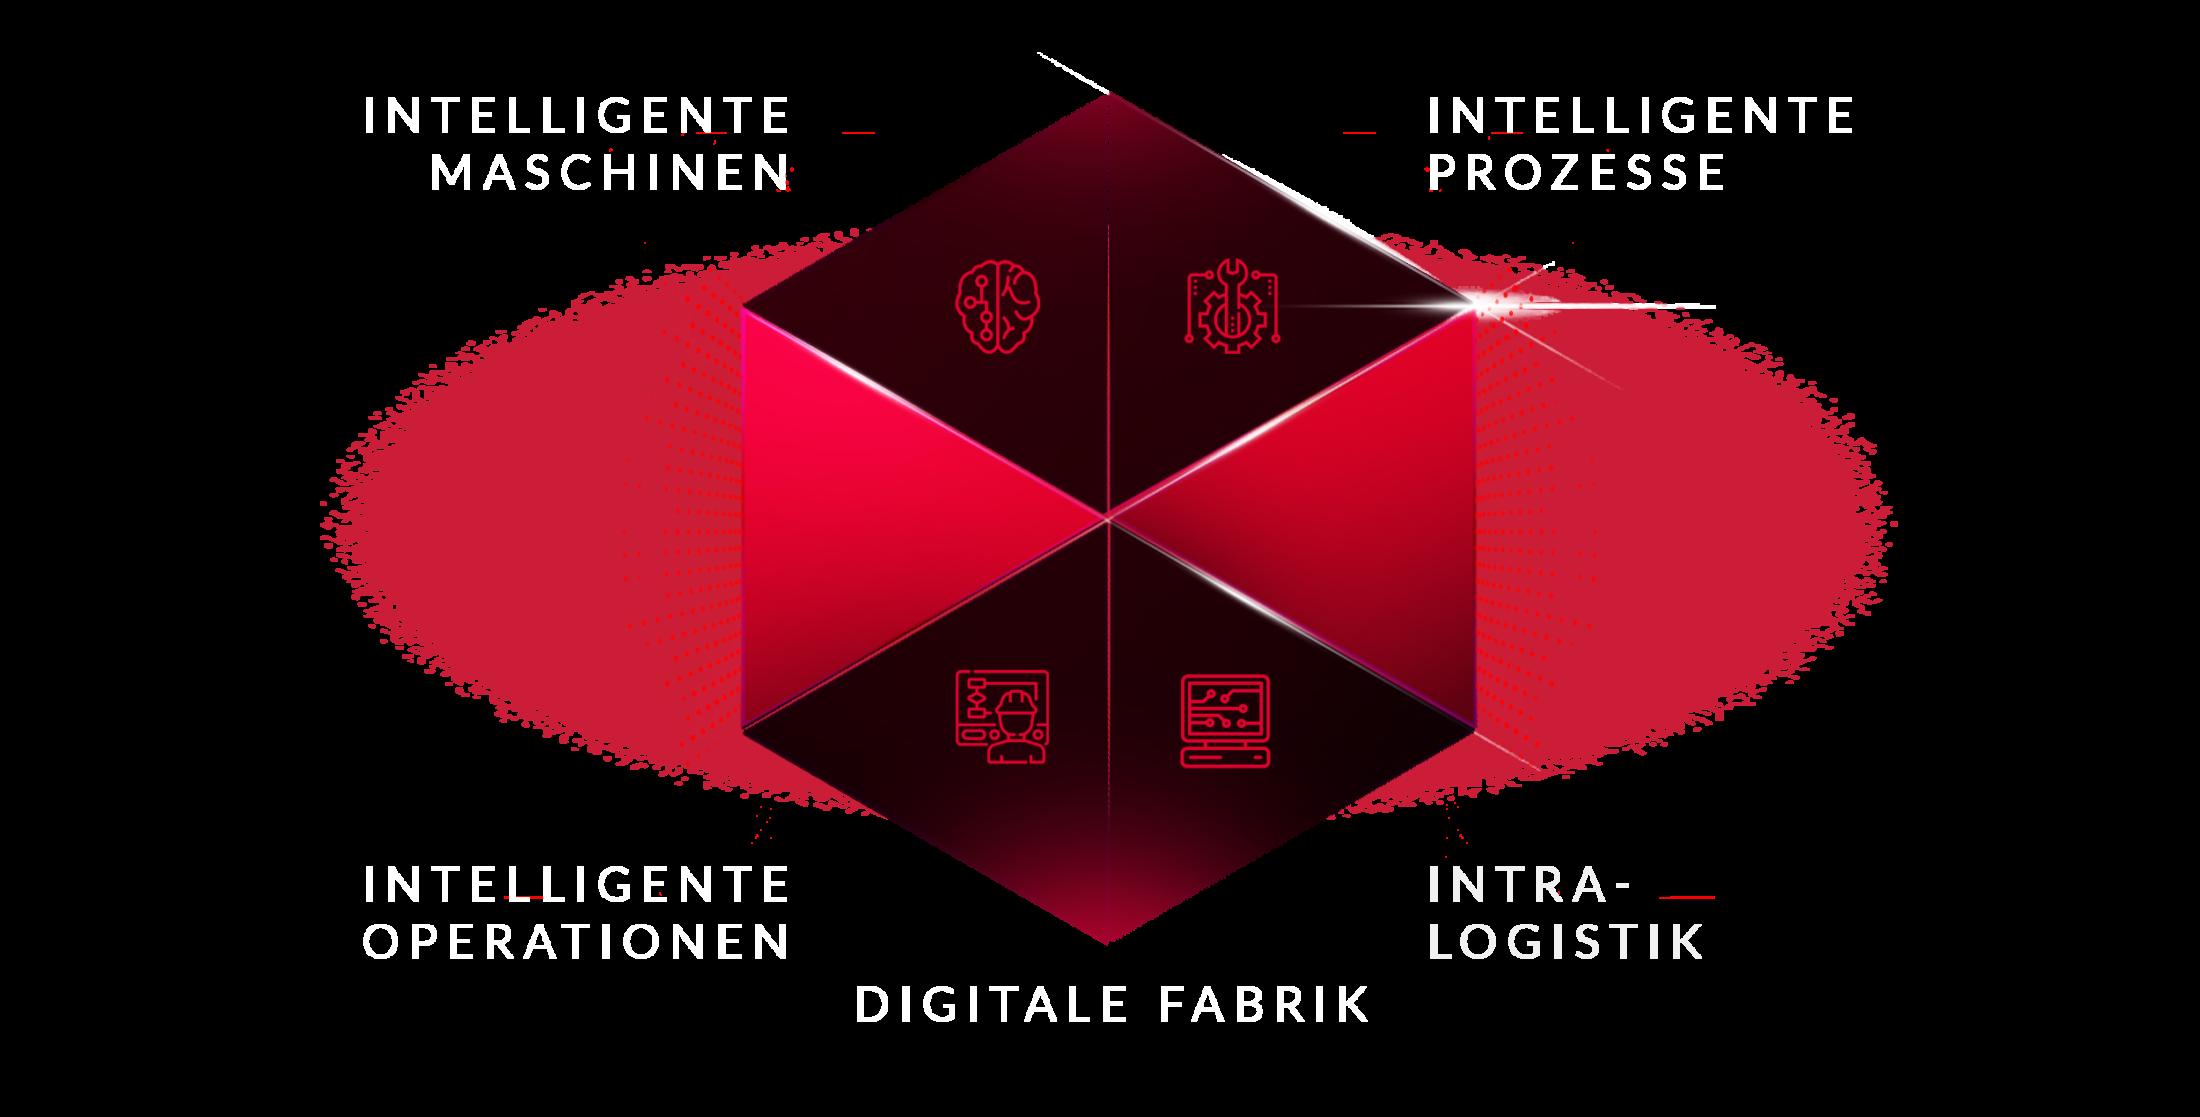 VB digital factory